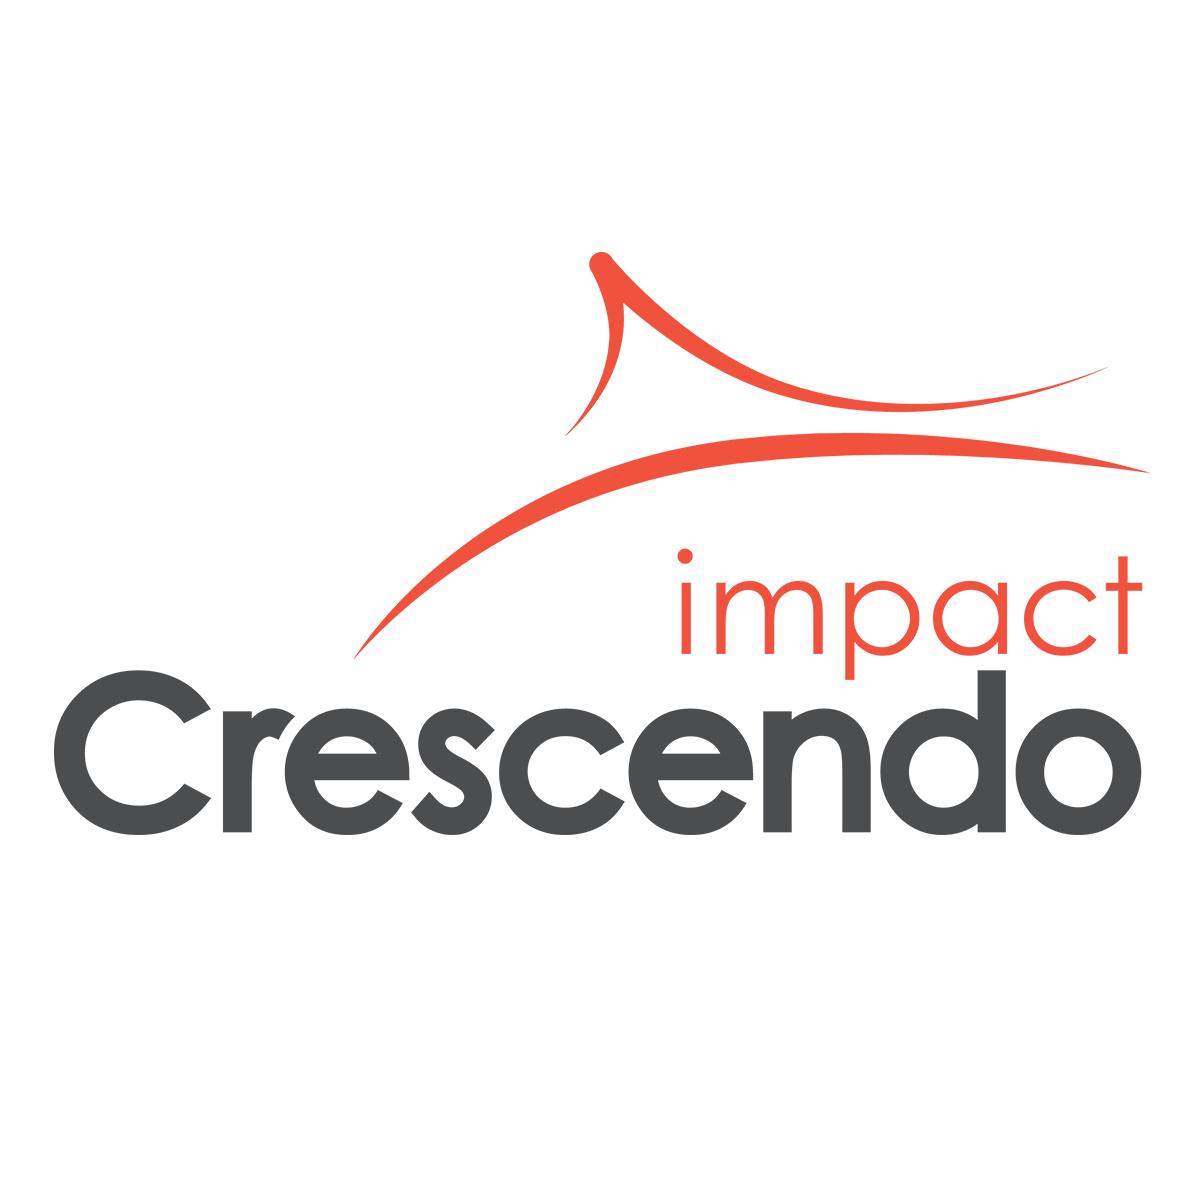 Impact Crescendo